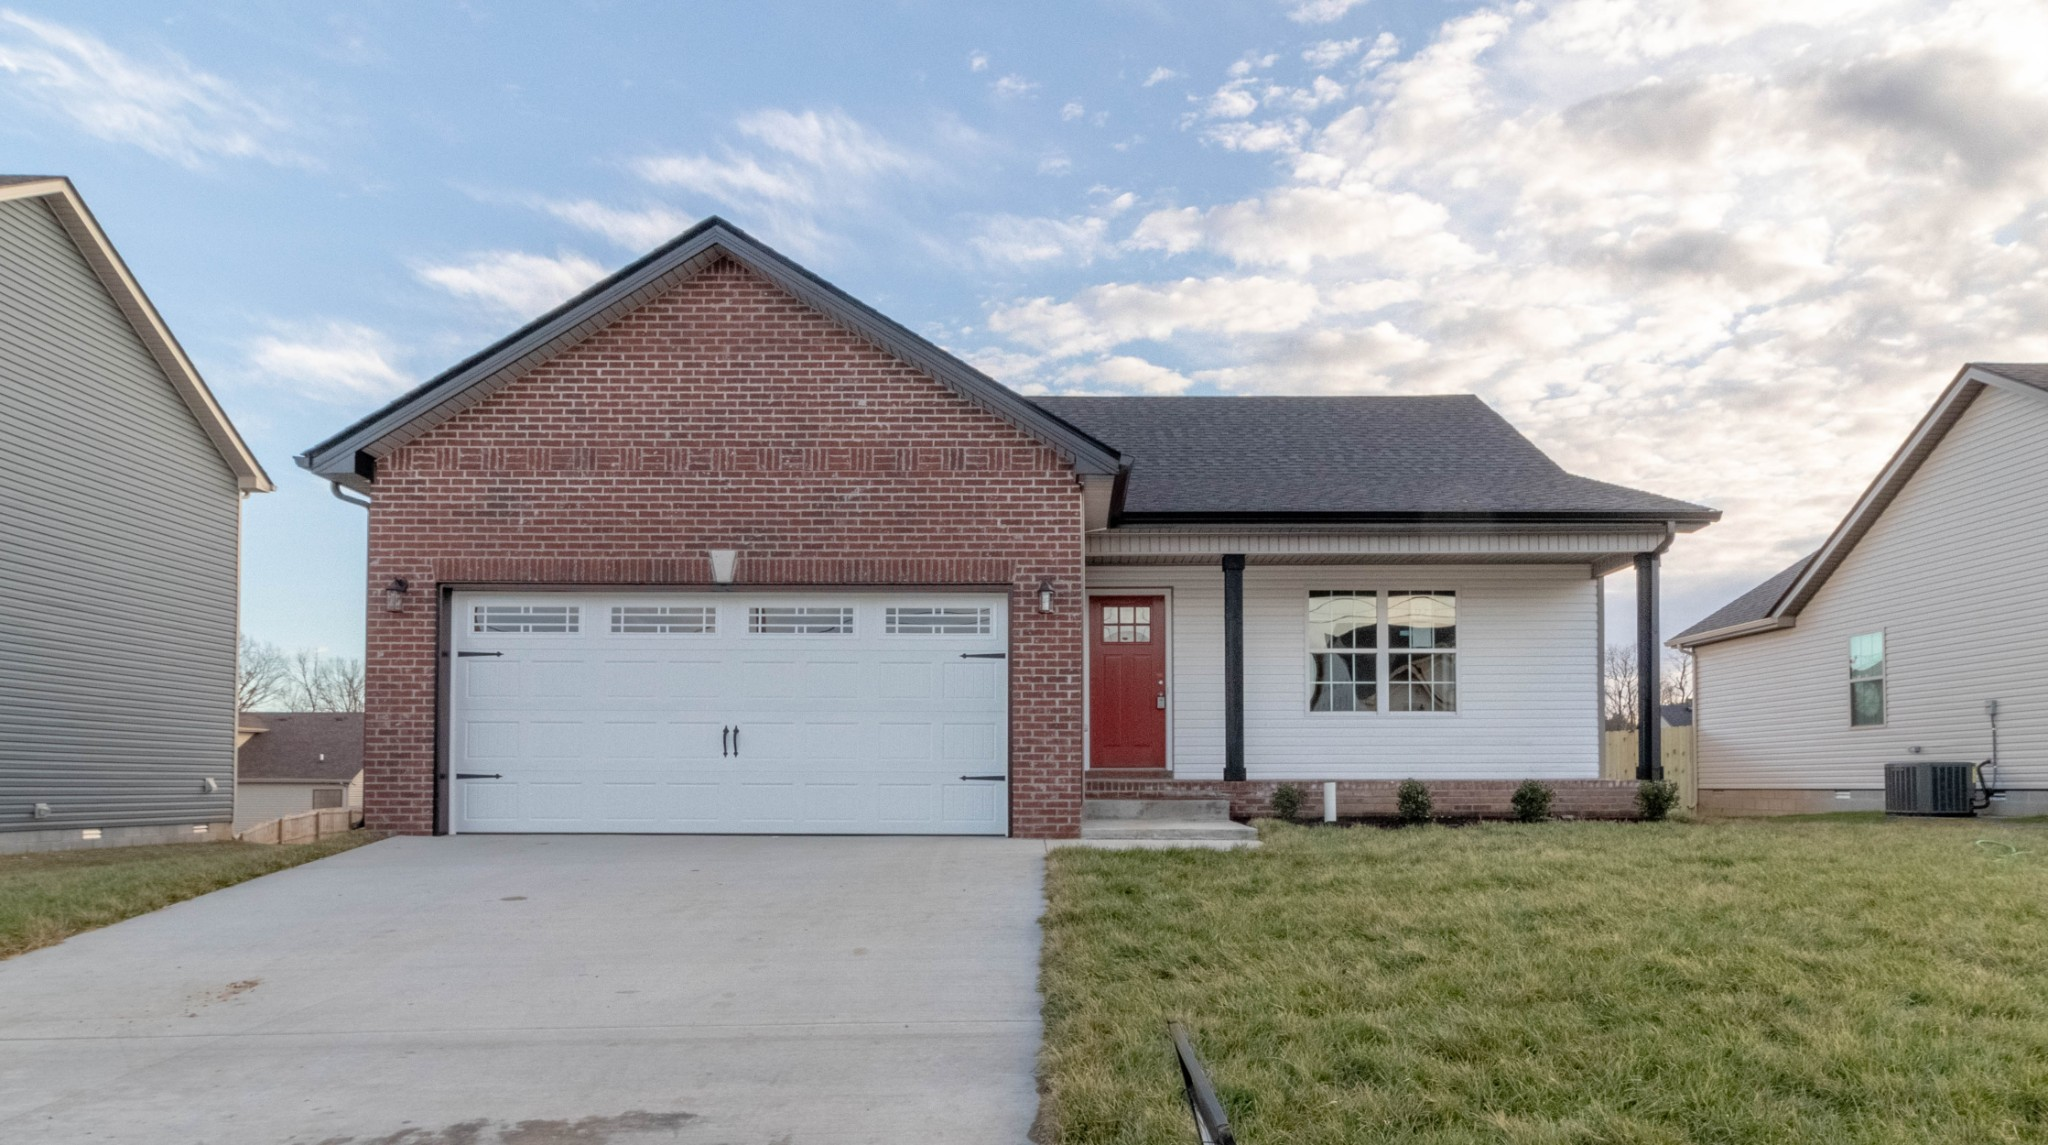 92 Rose Edd Estates, Oak Grove, KY 42262 - Oak Grove, KY real estate listing